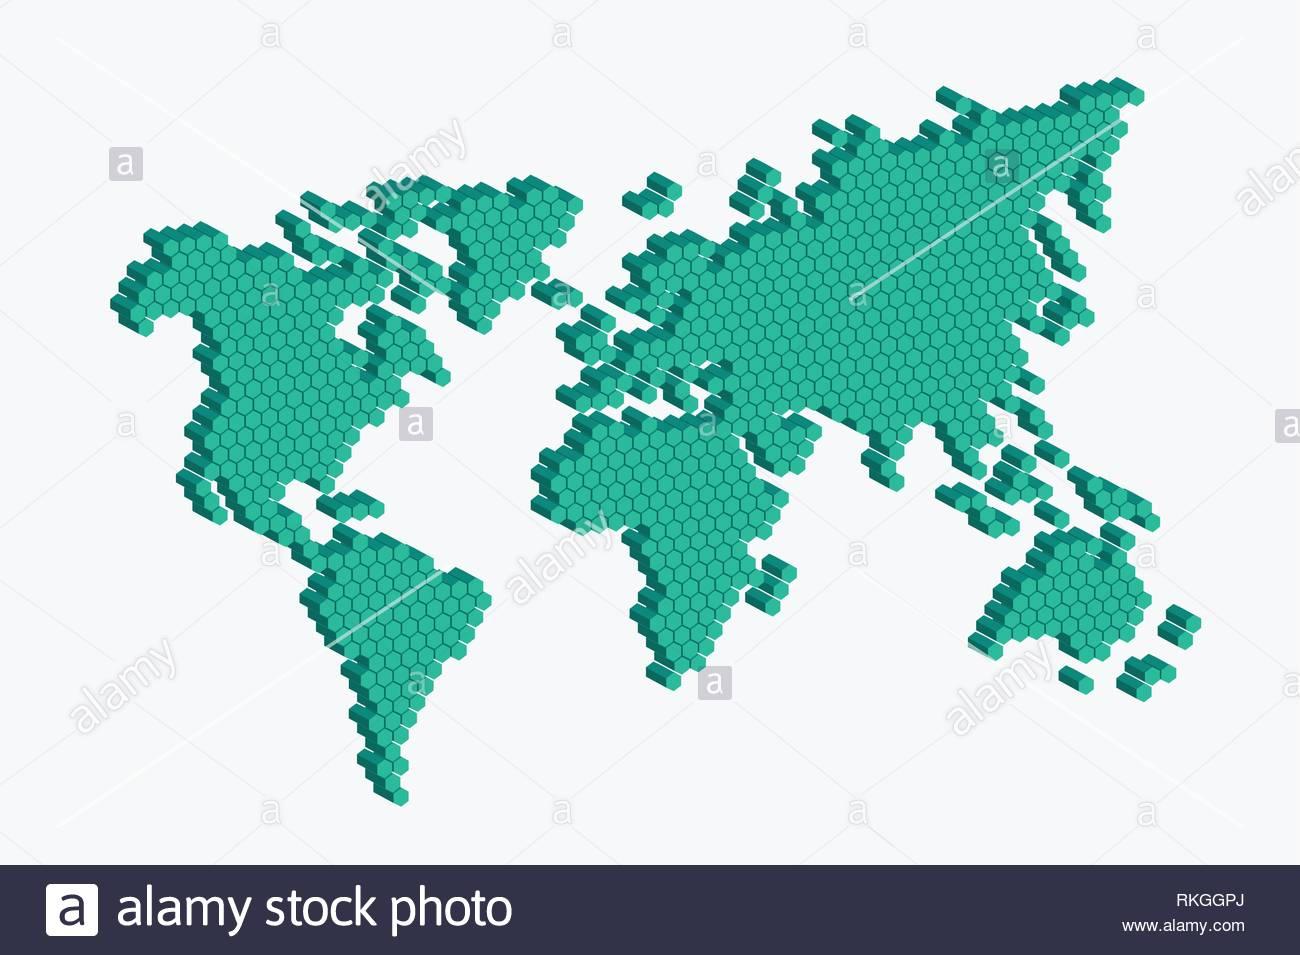 Hexagon Image Map